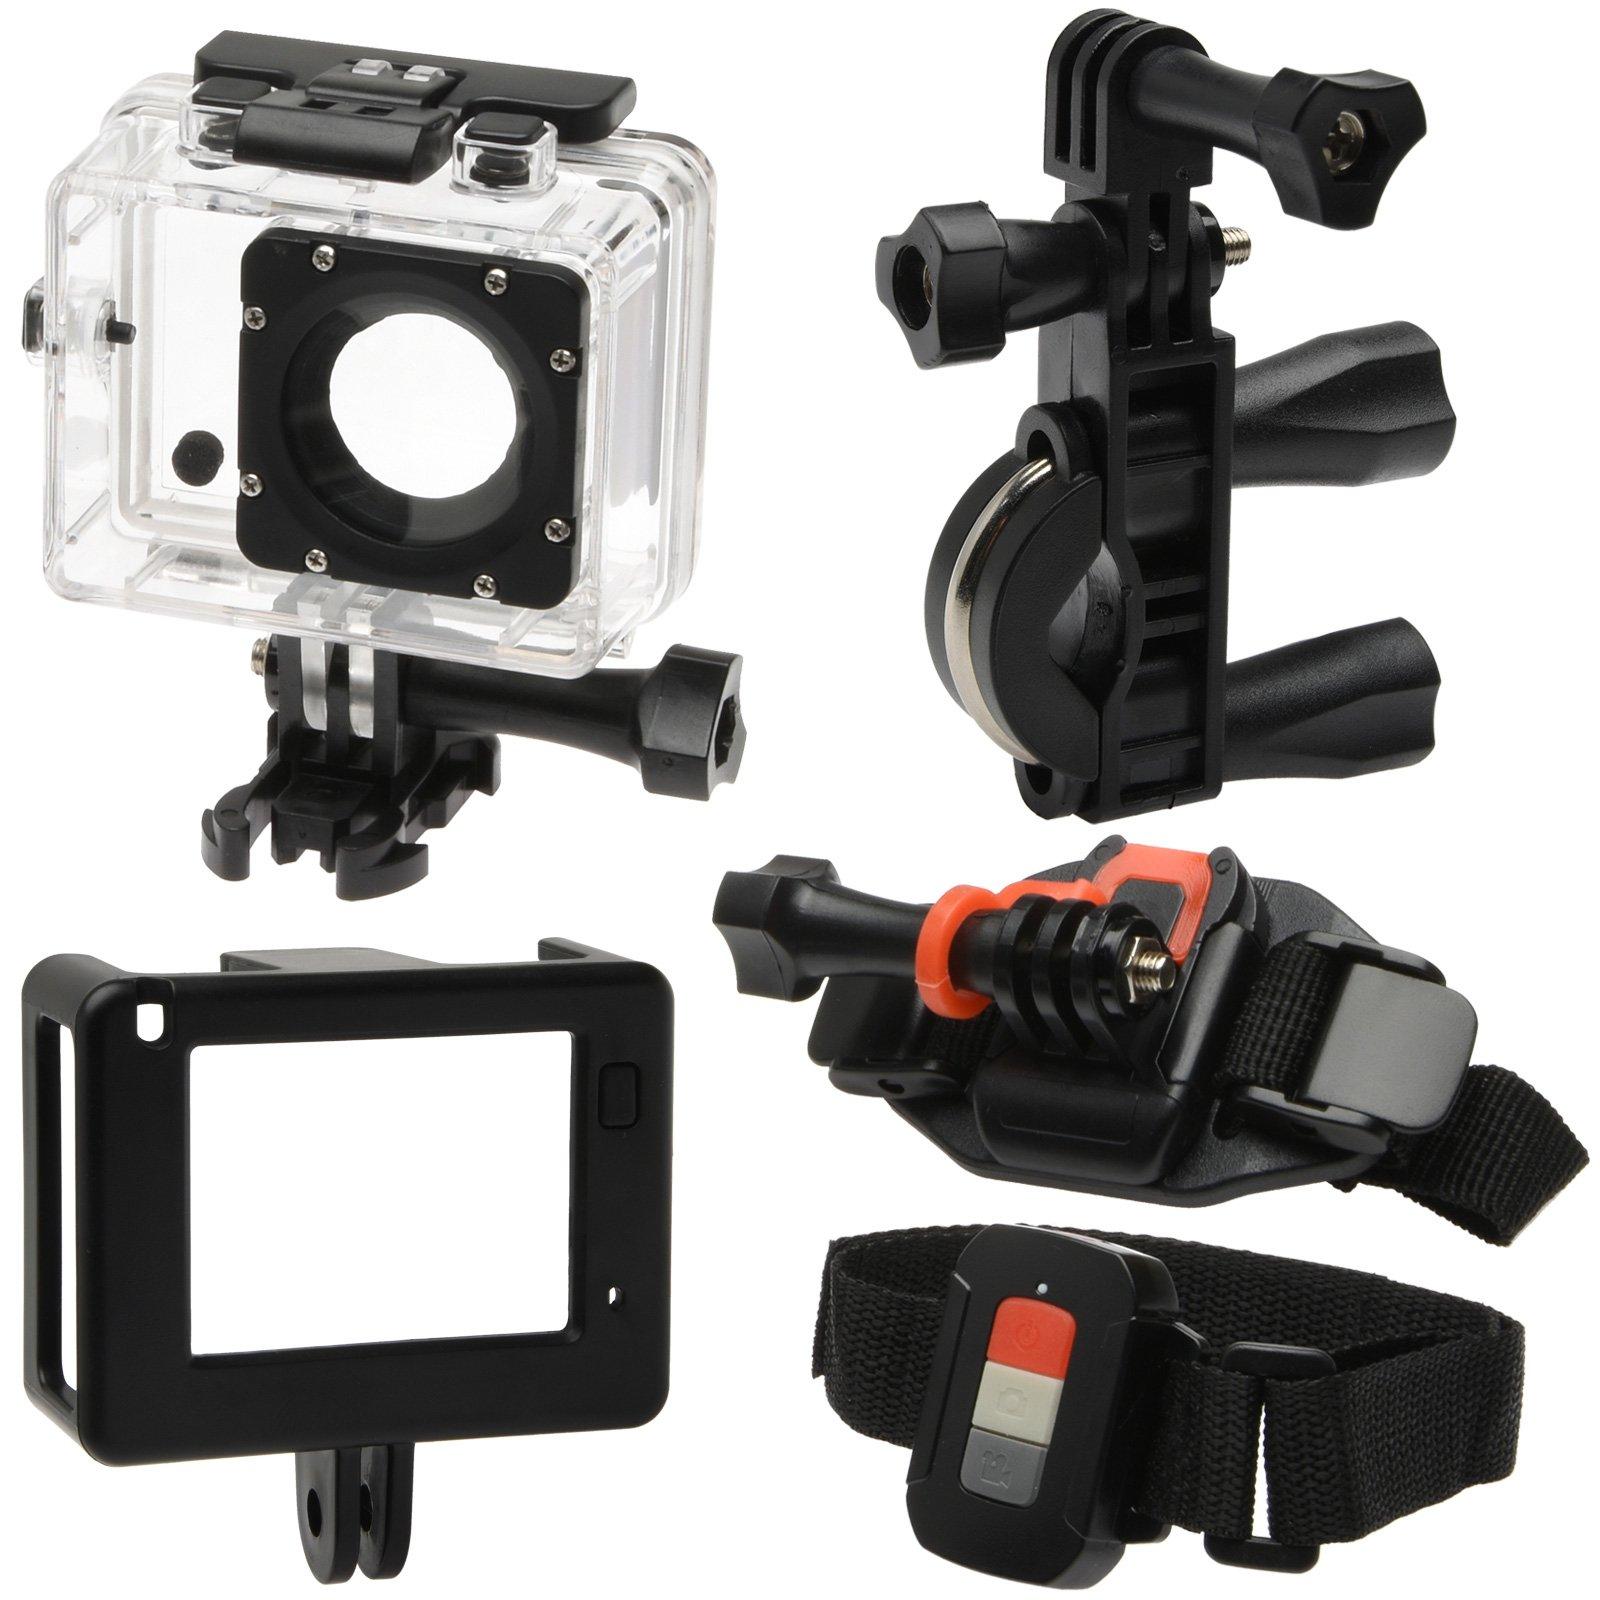 Vivitar DVR914HD 1440p HD Wi-Fi Waterproof Action Video Camera Camcorder (Black) + Remote, Helmet, Bike, Suction Cup + Dashboard Mounts + 64GB + Case Kit by Vivitar (Image #3)